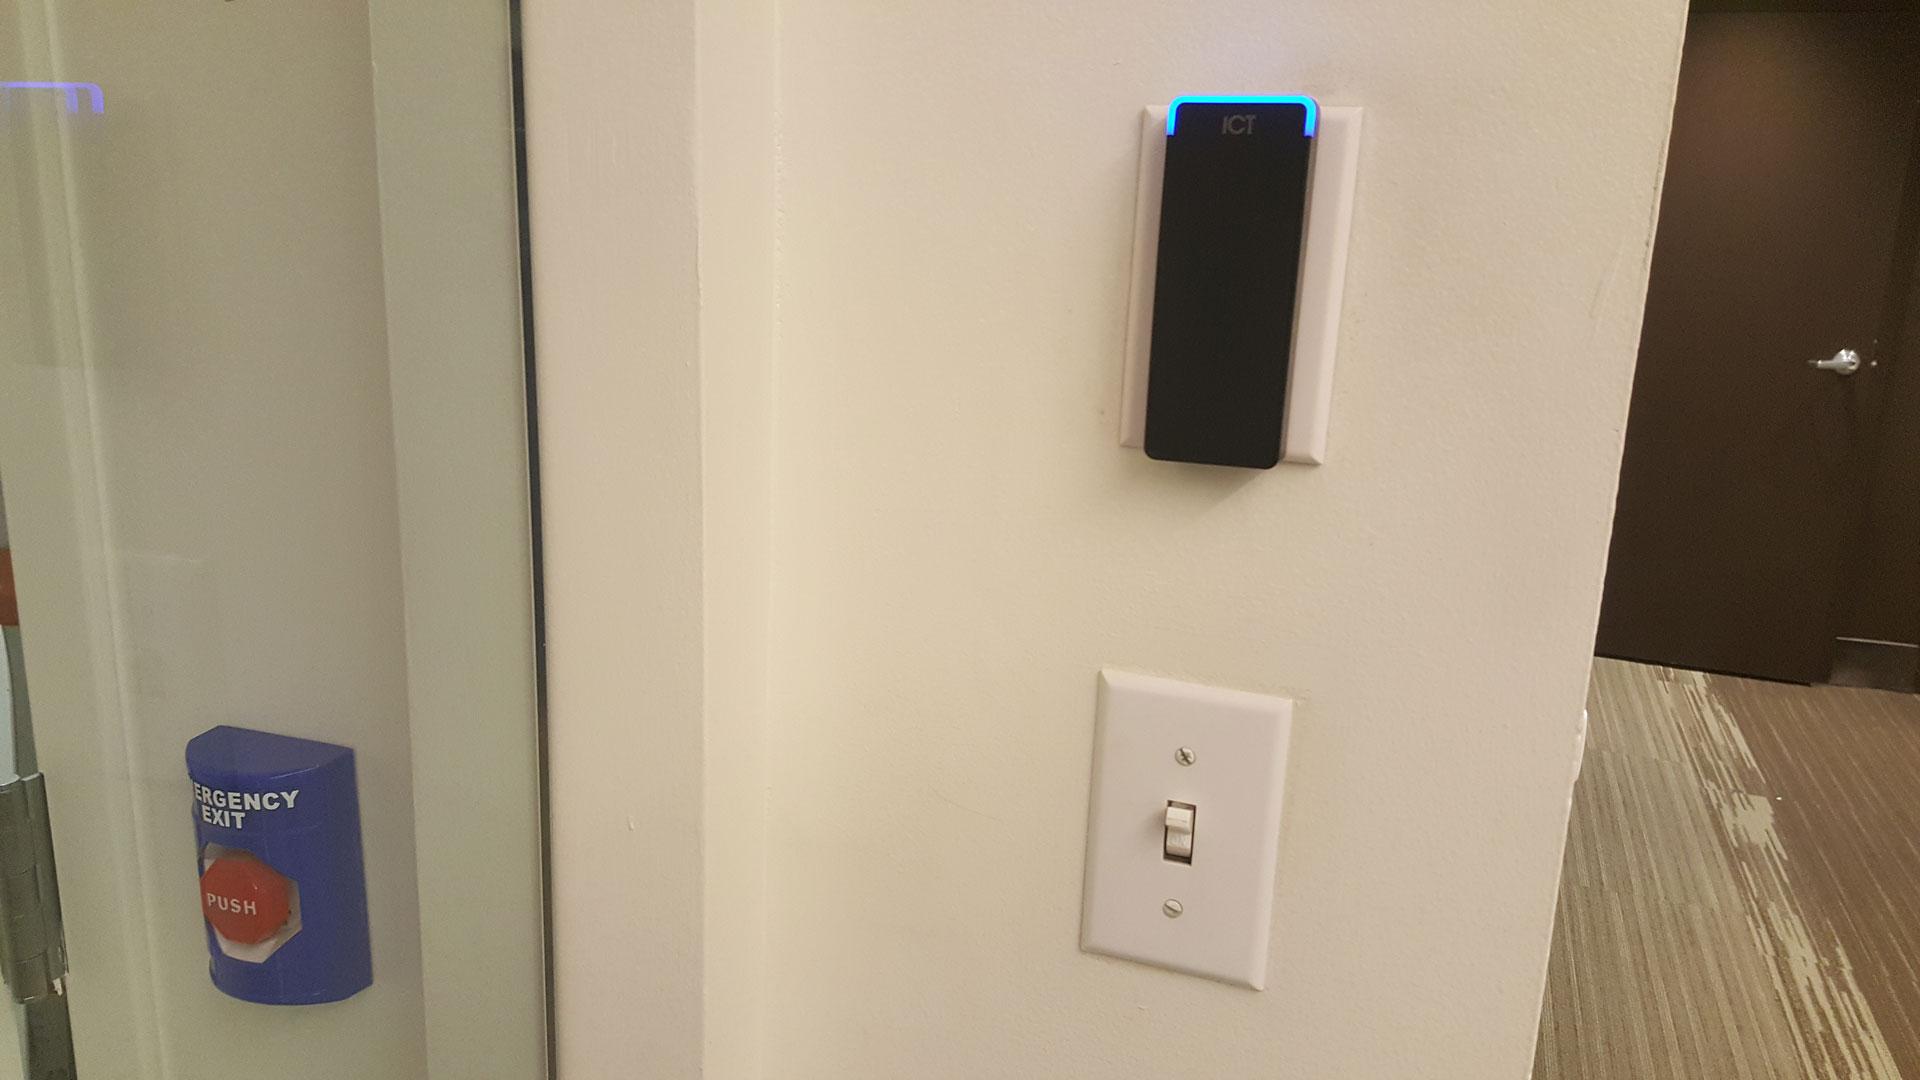 Door access control setup intellibeam for Door access controller